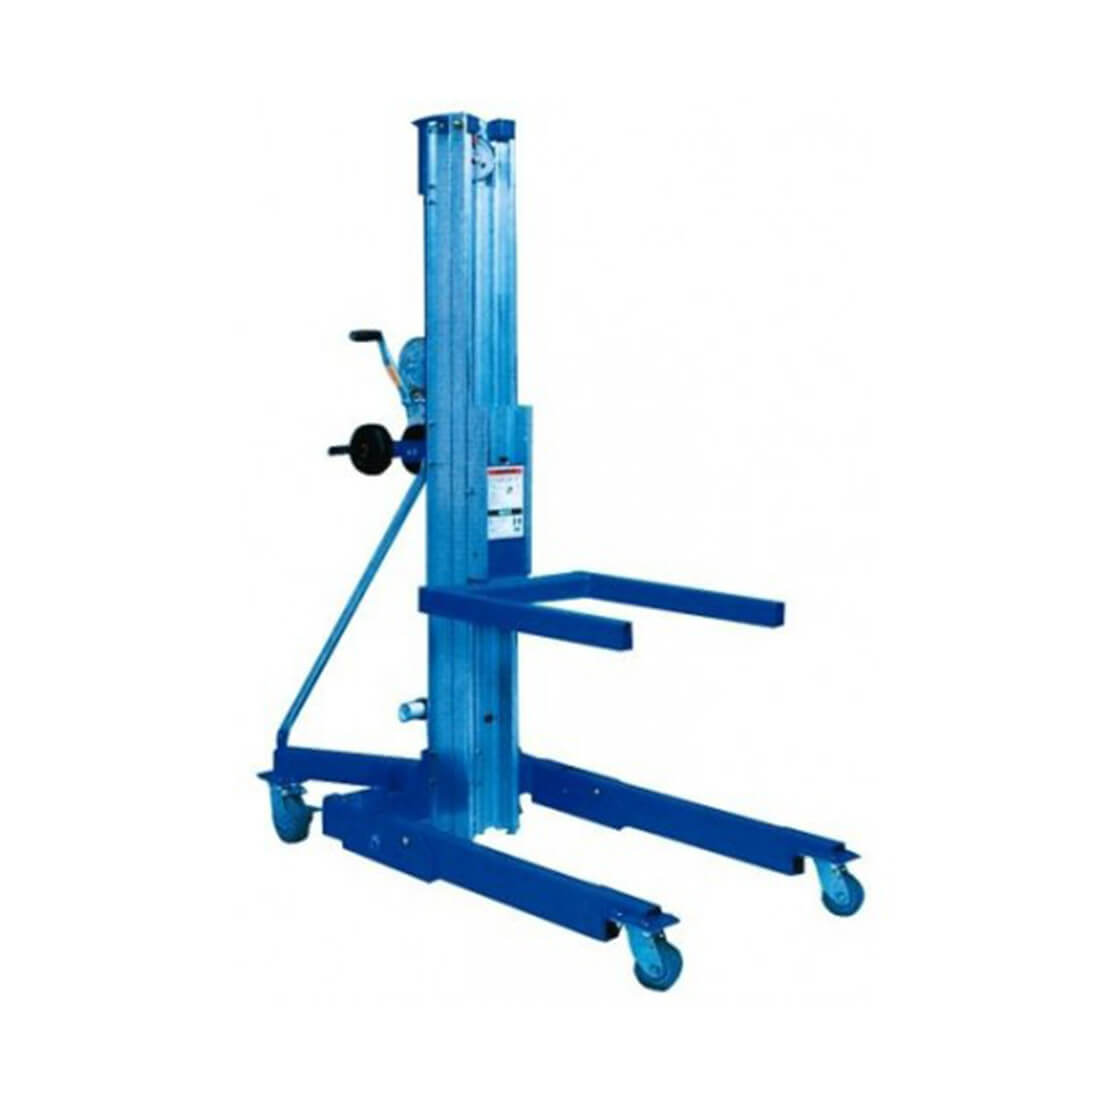 Alquiler de elevador manual de material 6 50m 363 kg for Maquinas de aire acondicionado baratas